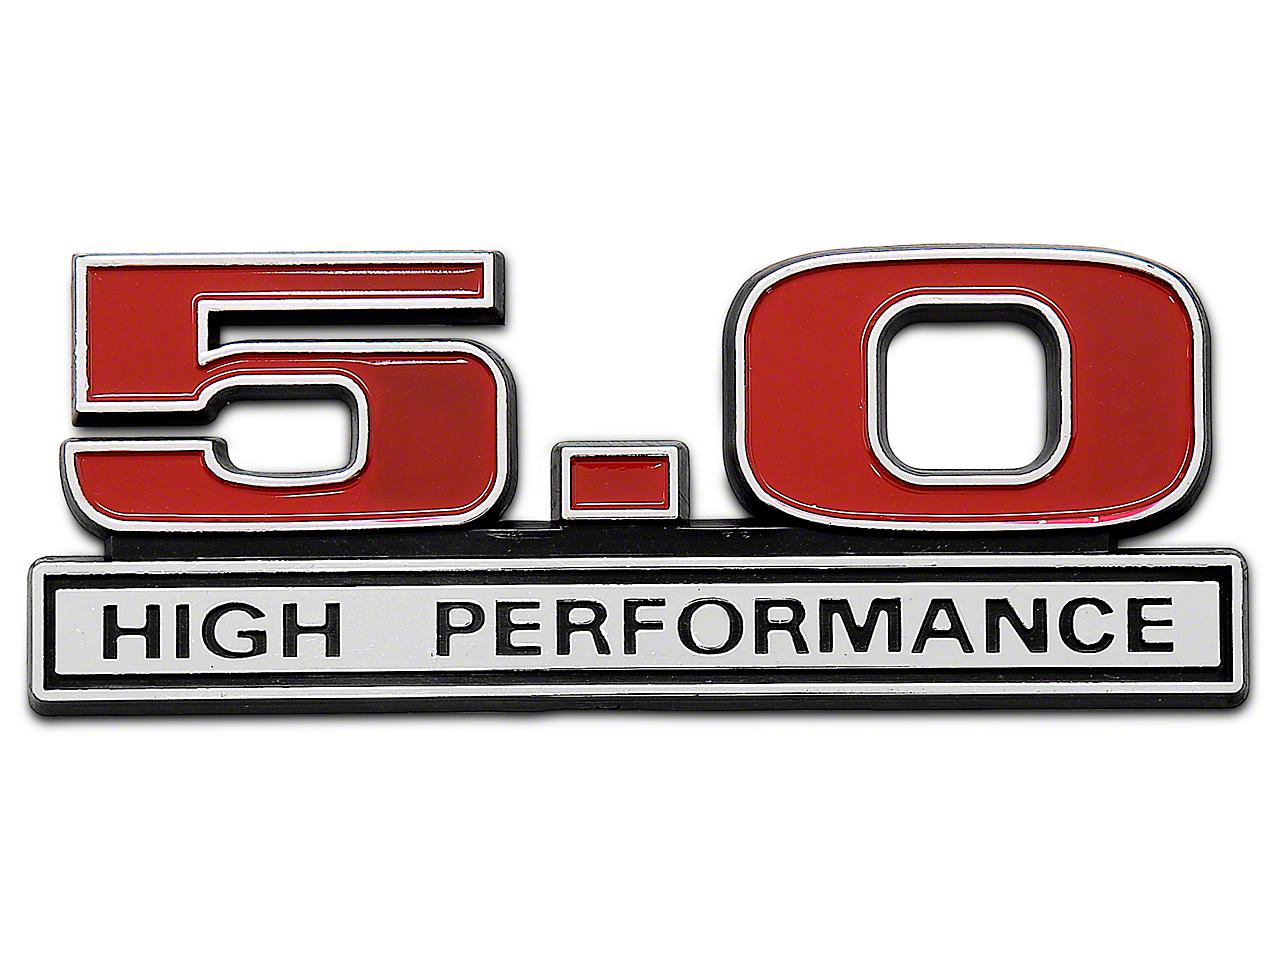 SpeedForm Red 5.0 High Performance Emblem